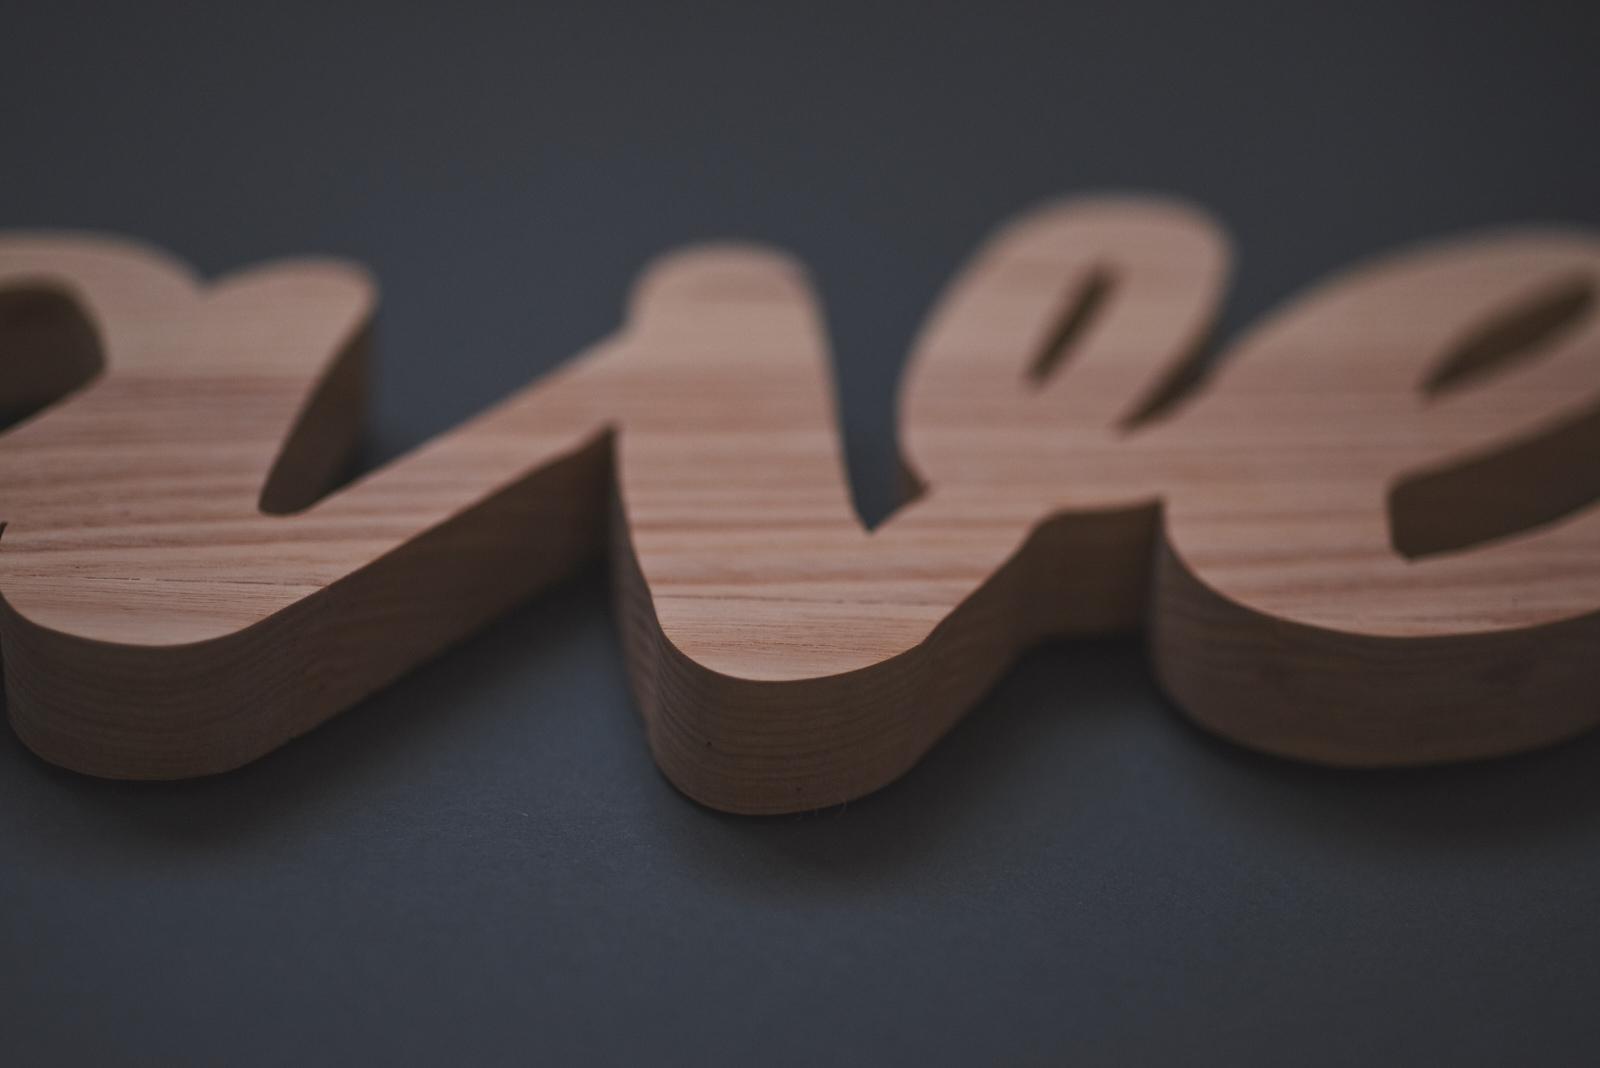 Handmade Wood Typography | epspictures